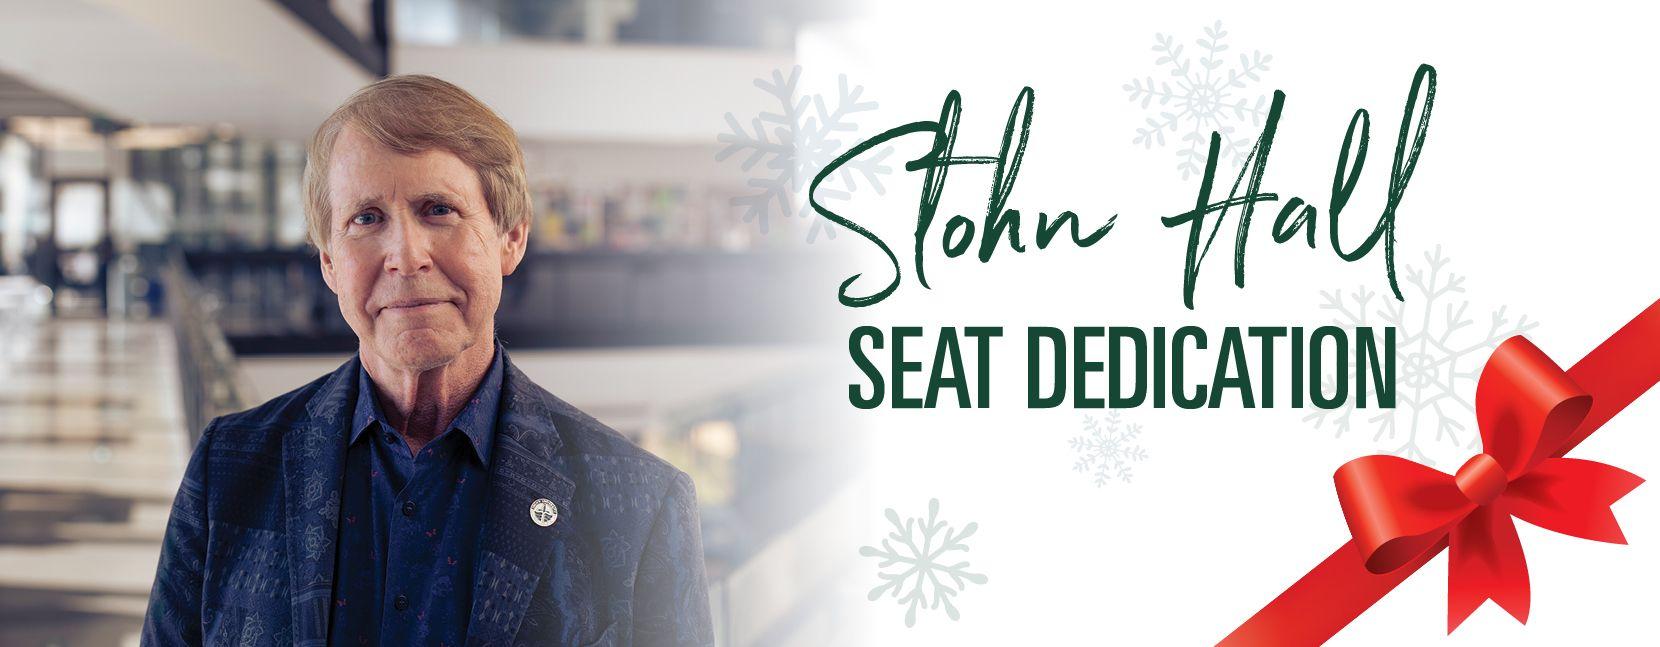 Stohn Hall Seat Dedication